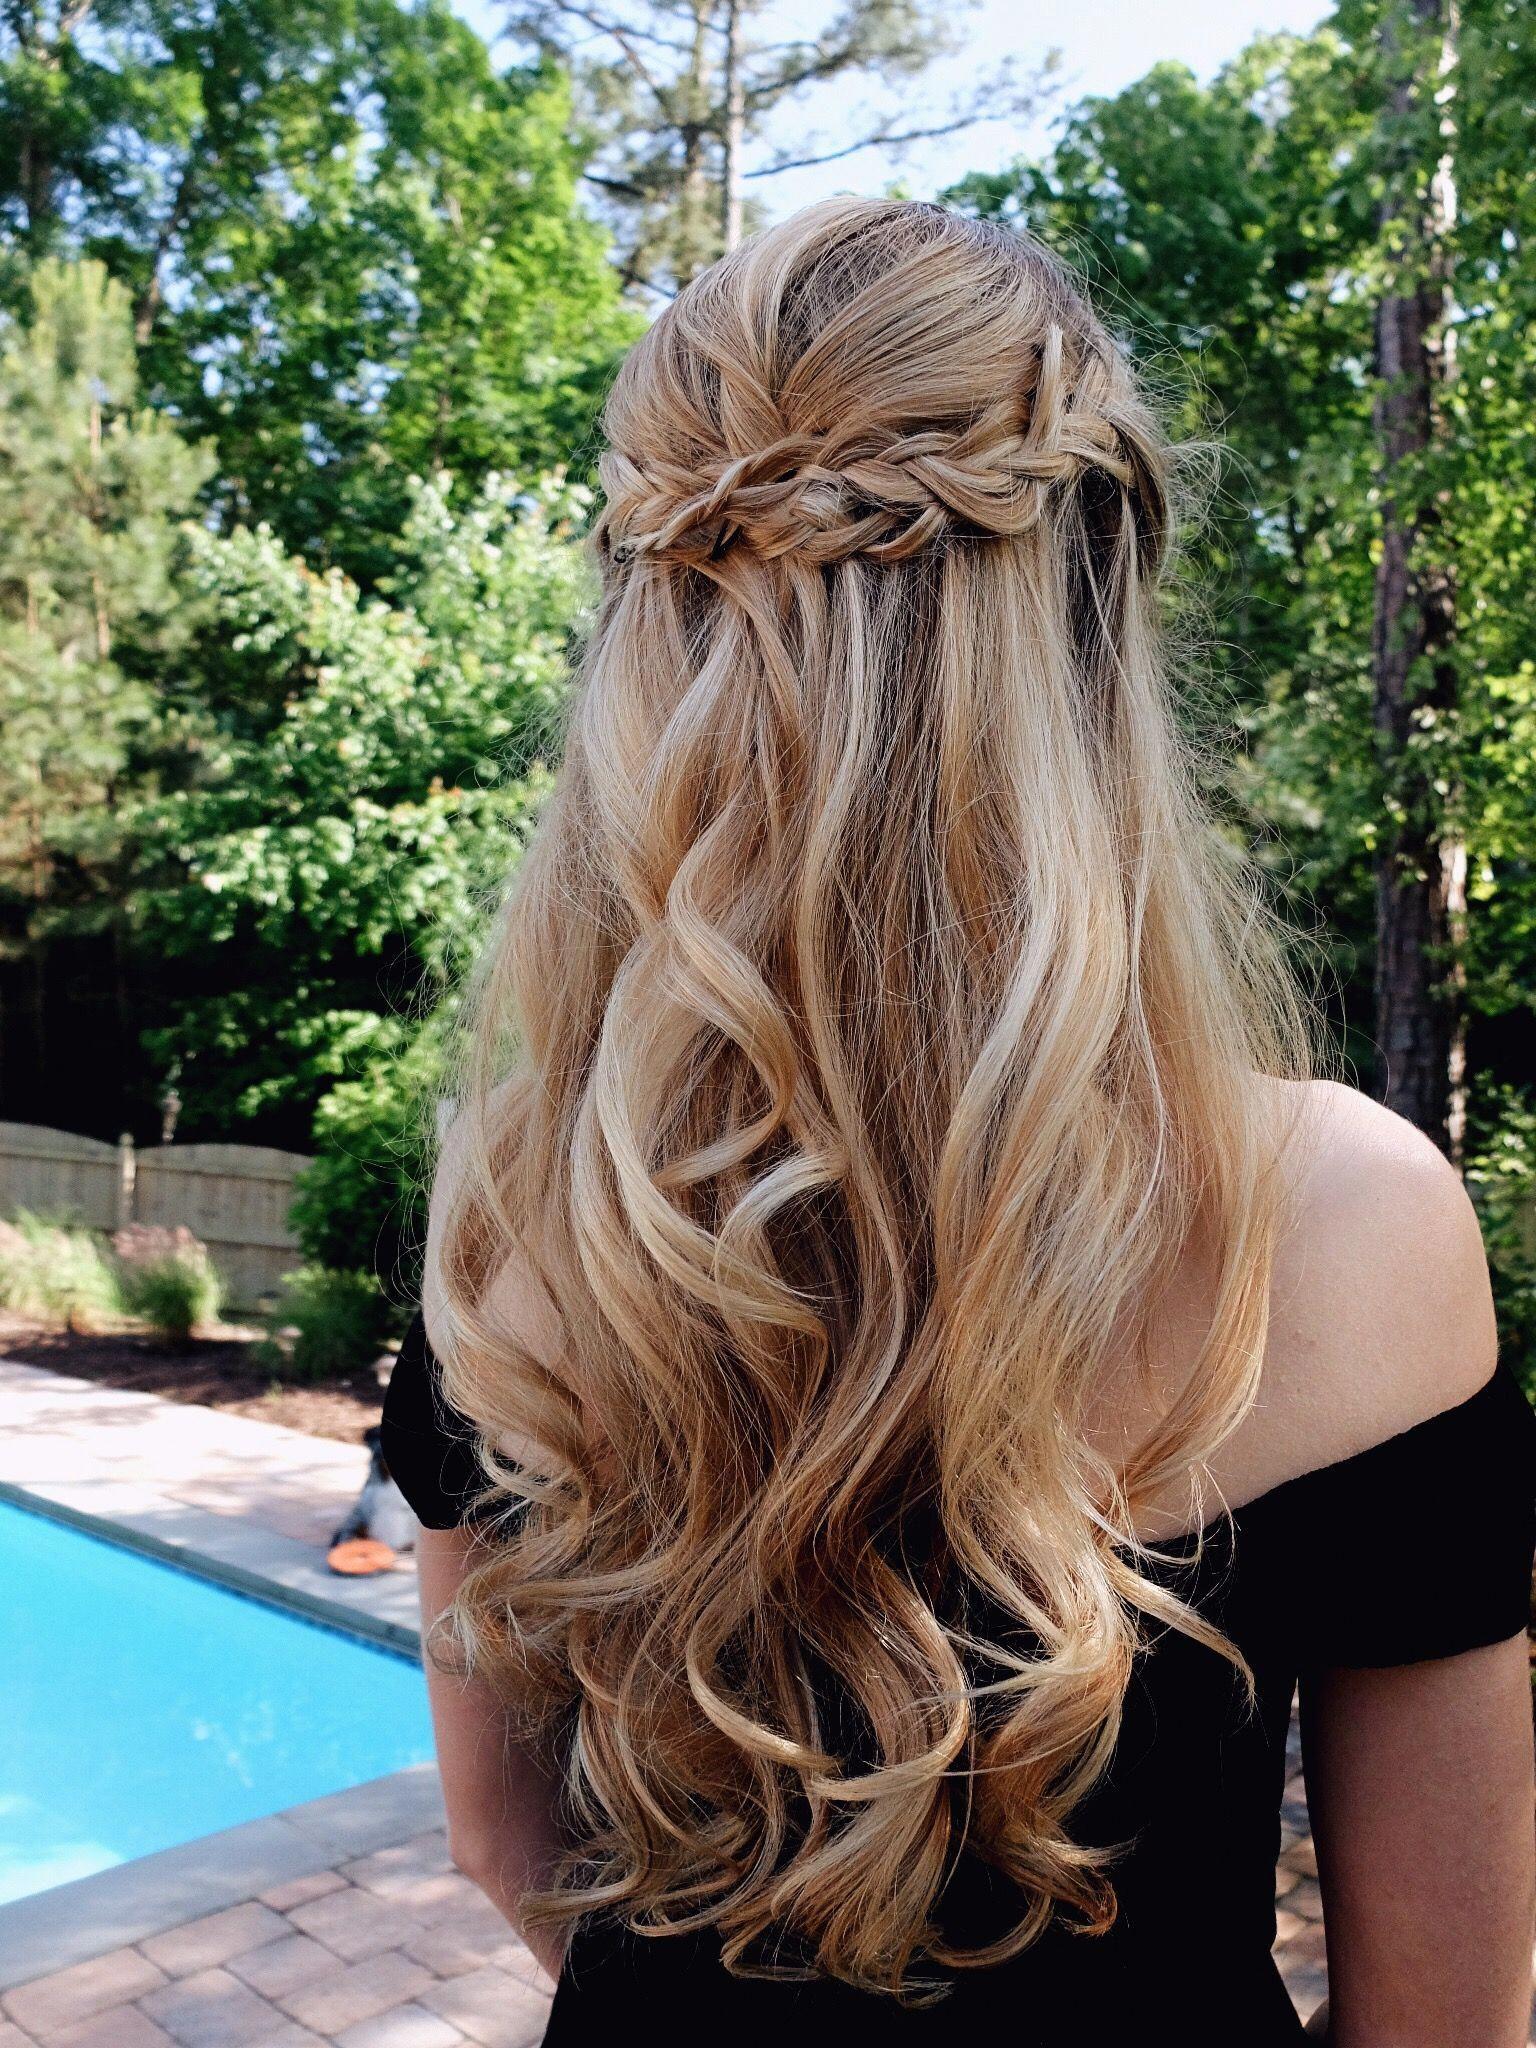 Beautiful Prom Hair #prom #promhair #braid #curls in 2020 ...